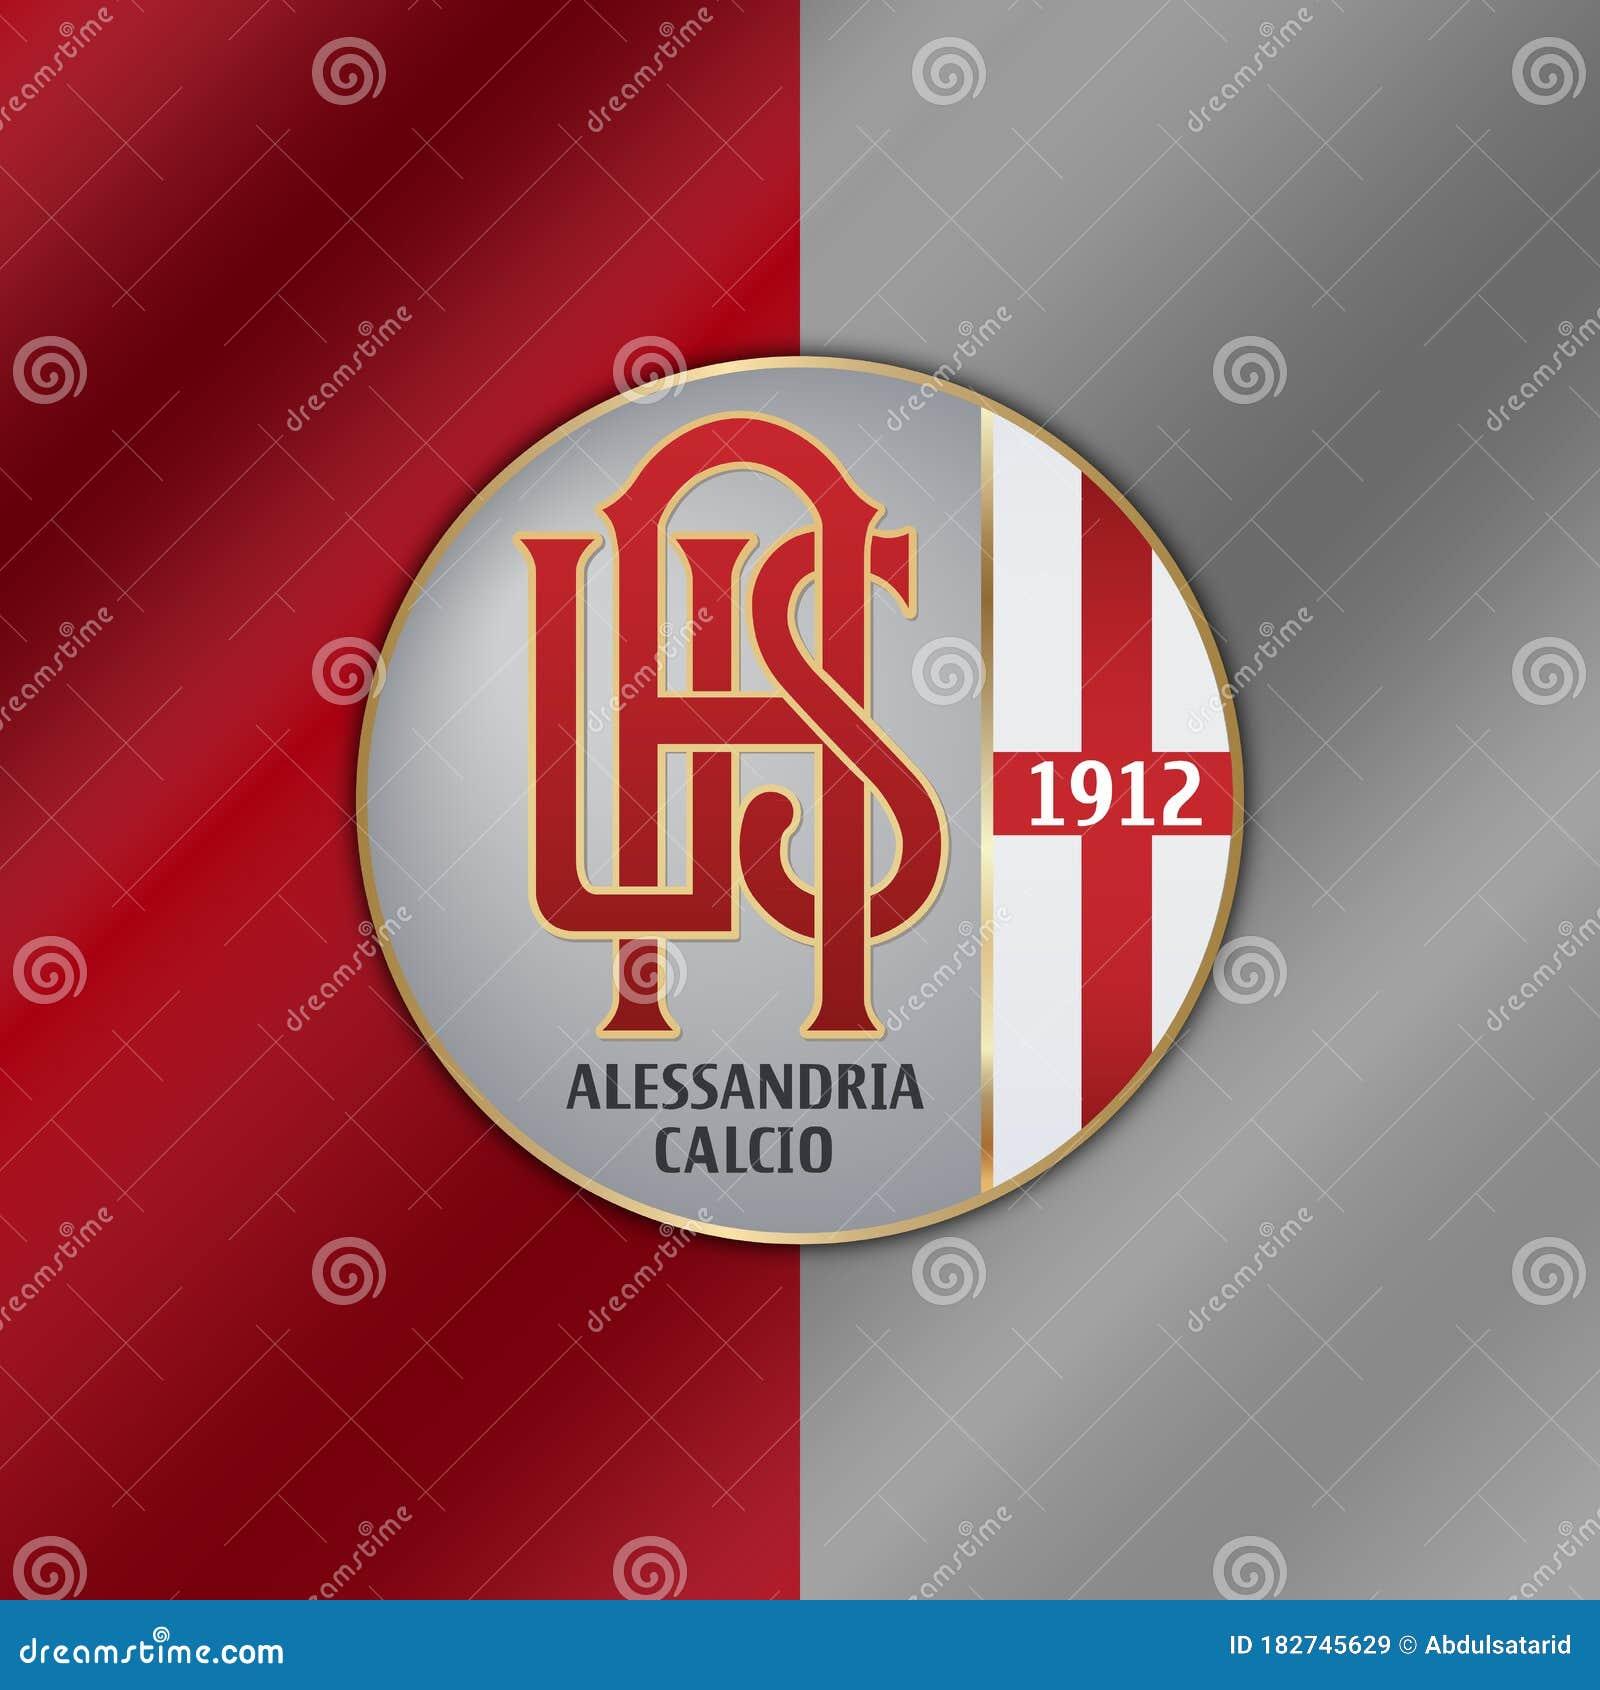 Alessandria Calcio emblem editorial stock image. Illustration of emblem -  182745629